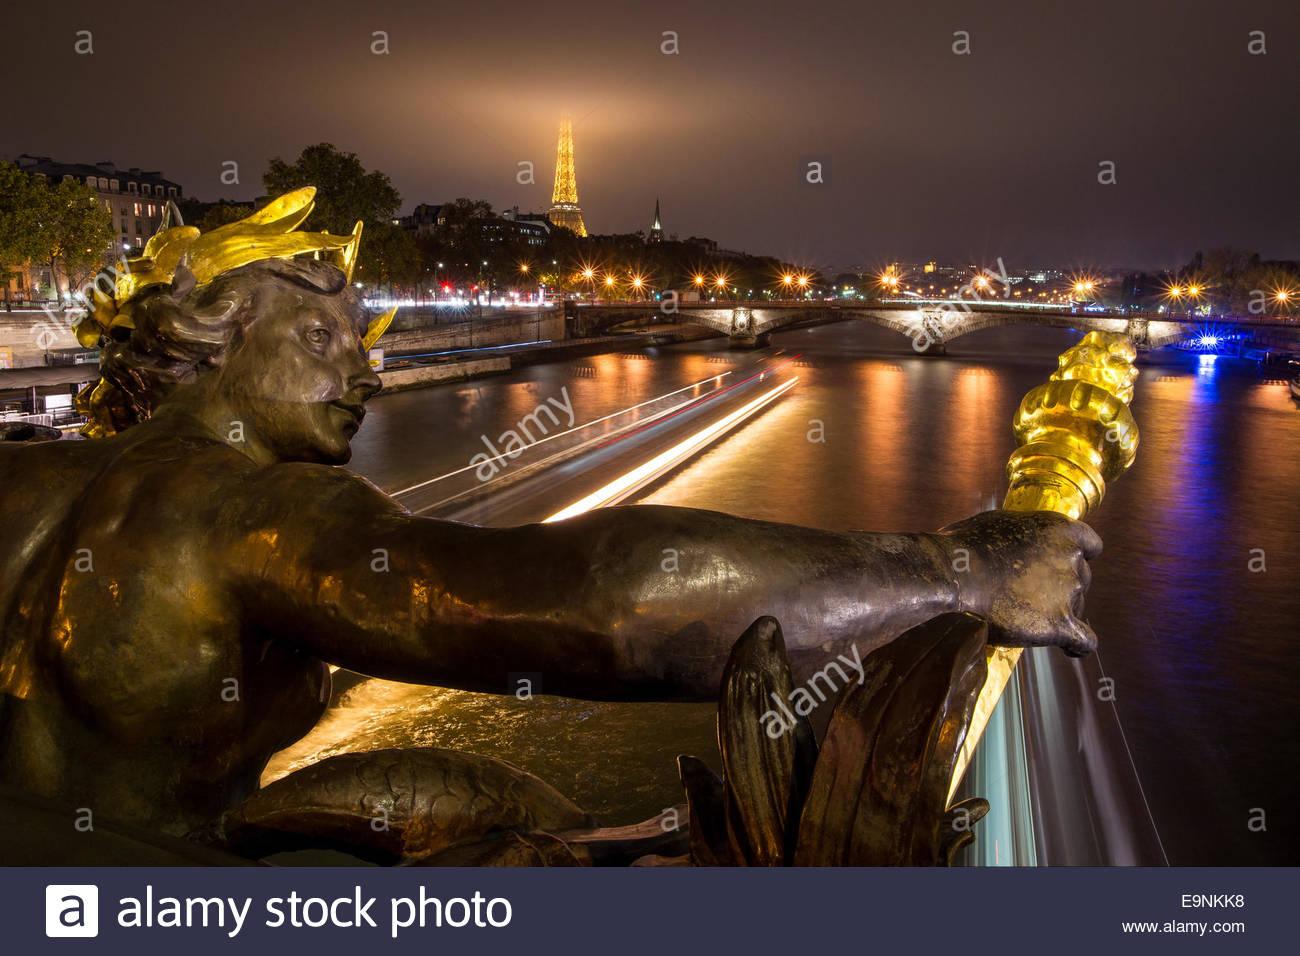 paris-pont-alexandre-iii-E9NKK8.jpg